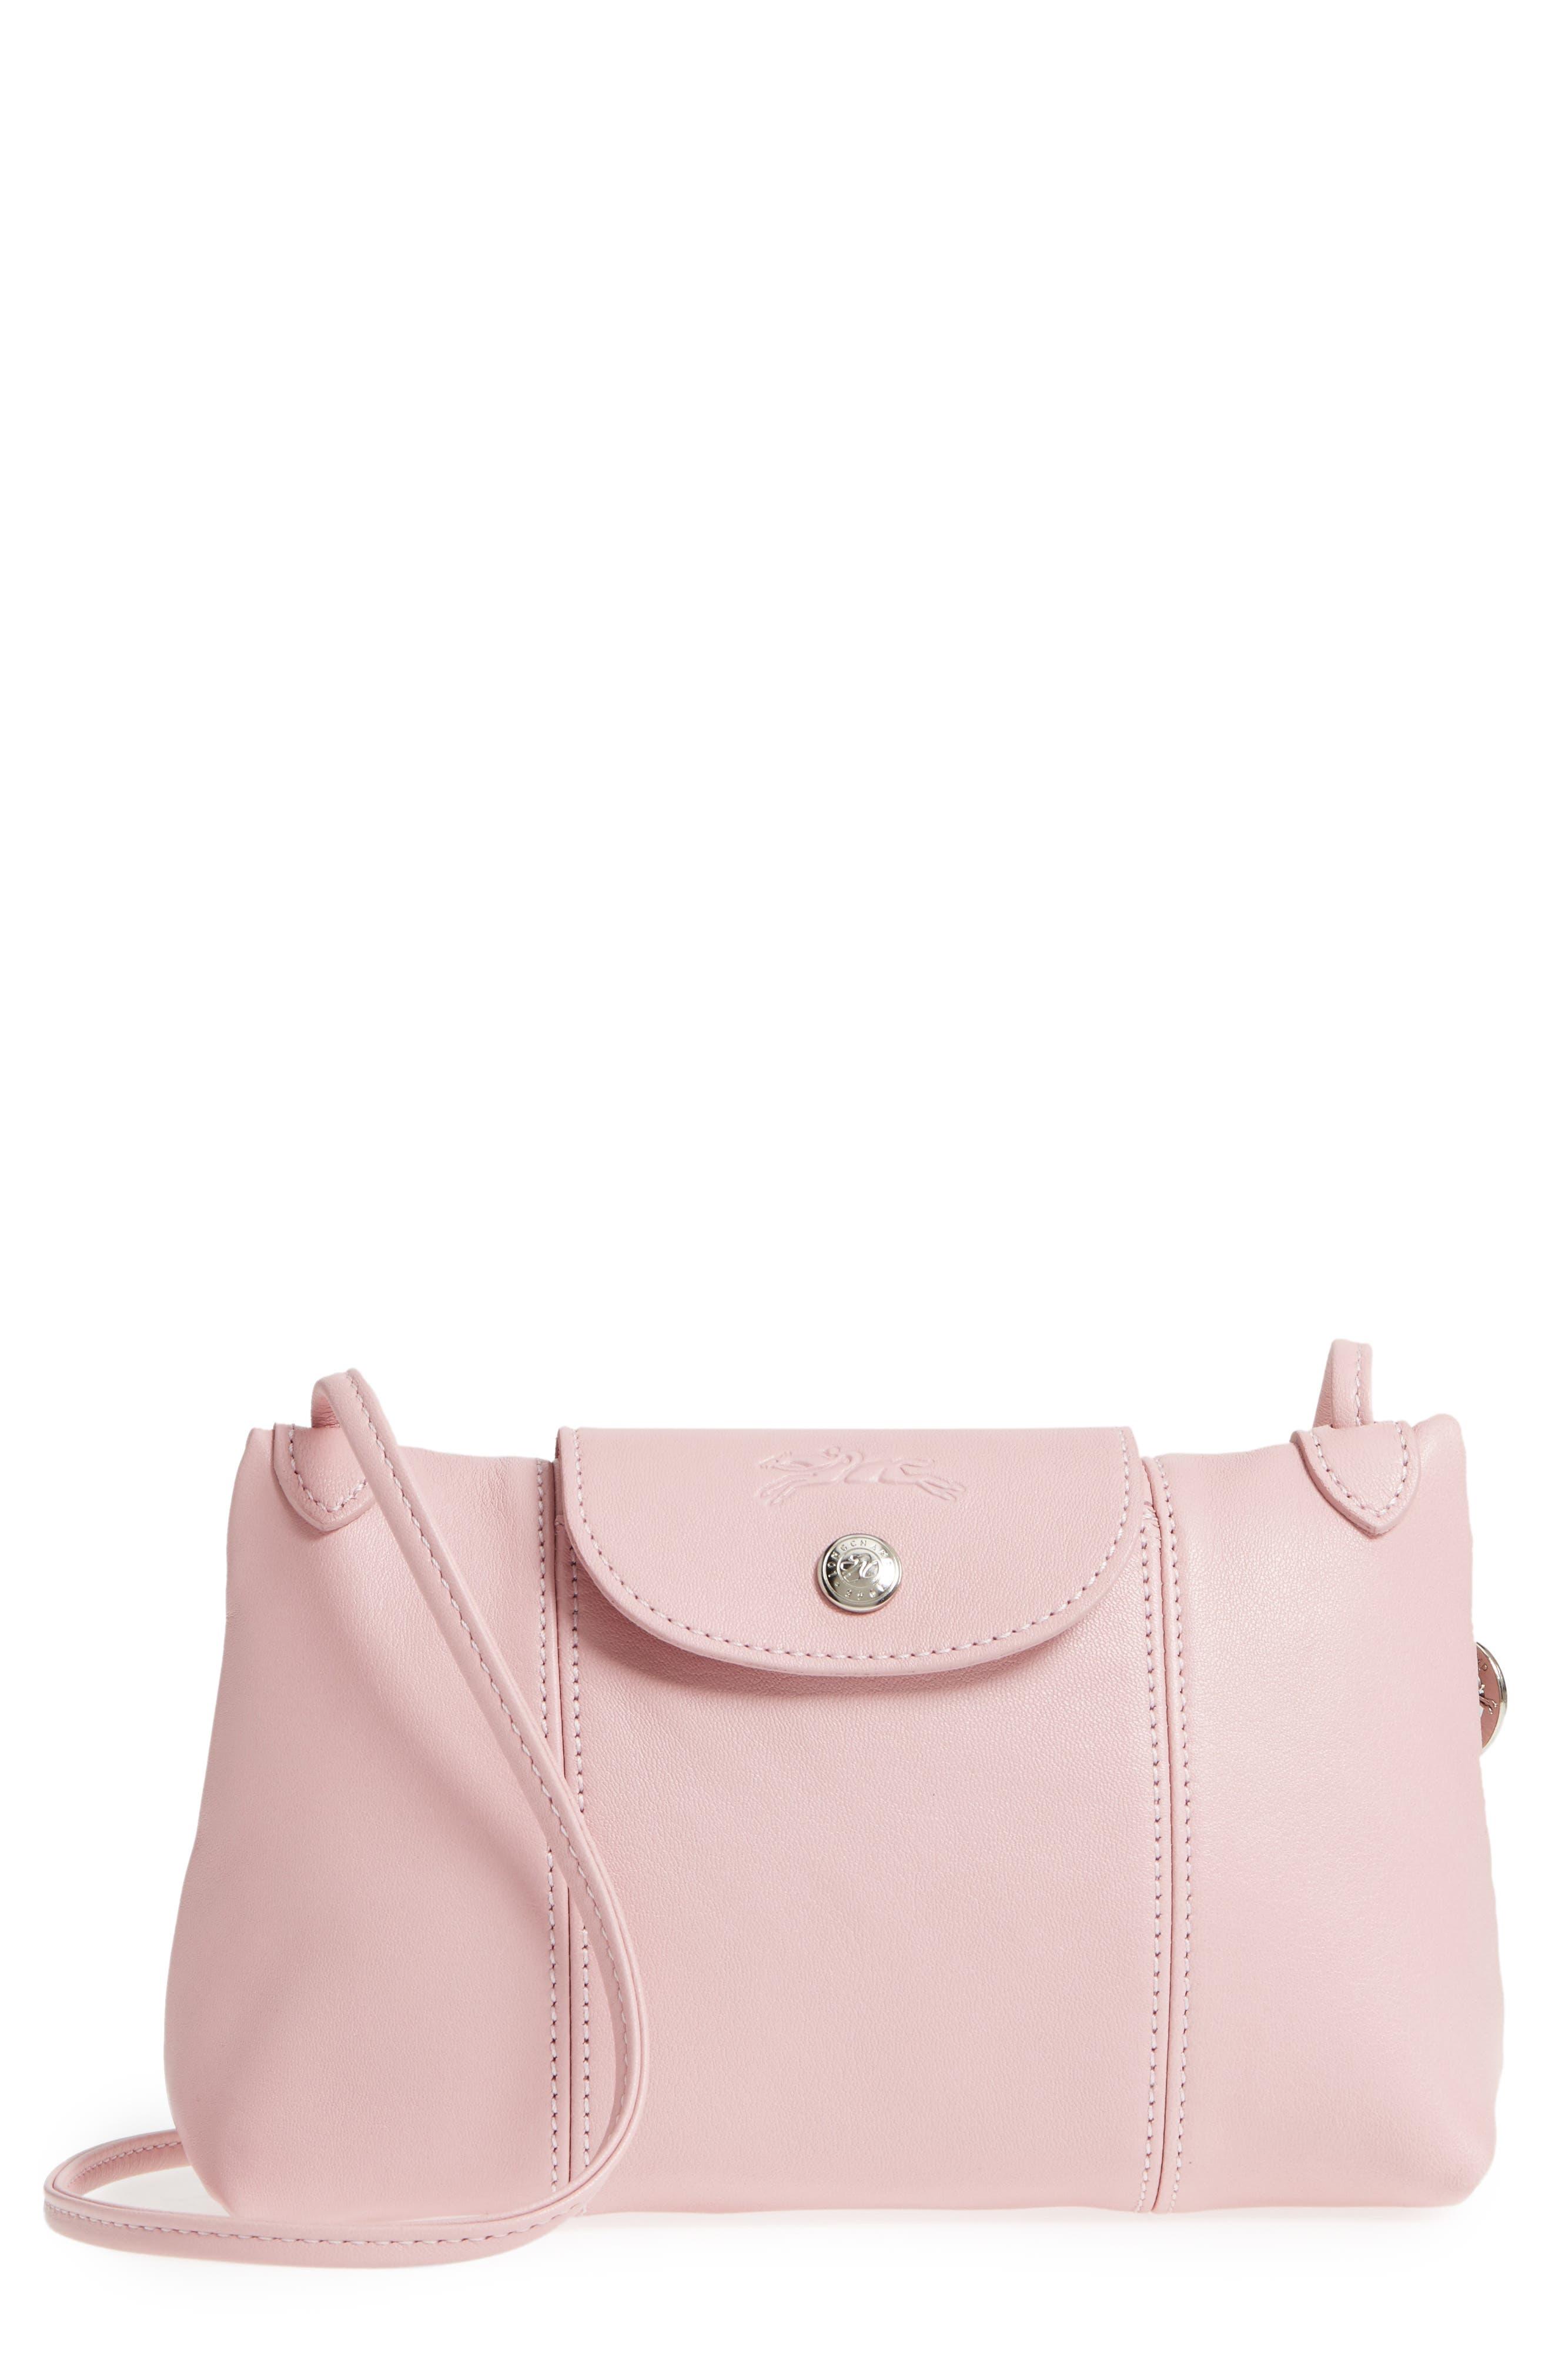 Longchamp Le Pliage - Cuir Crossbody Bag